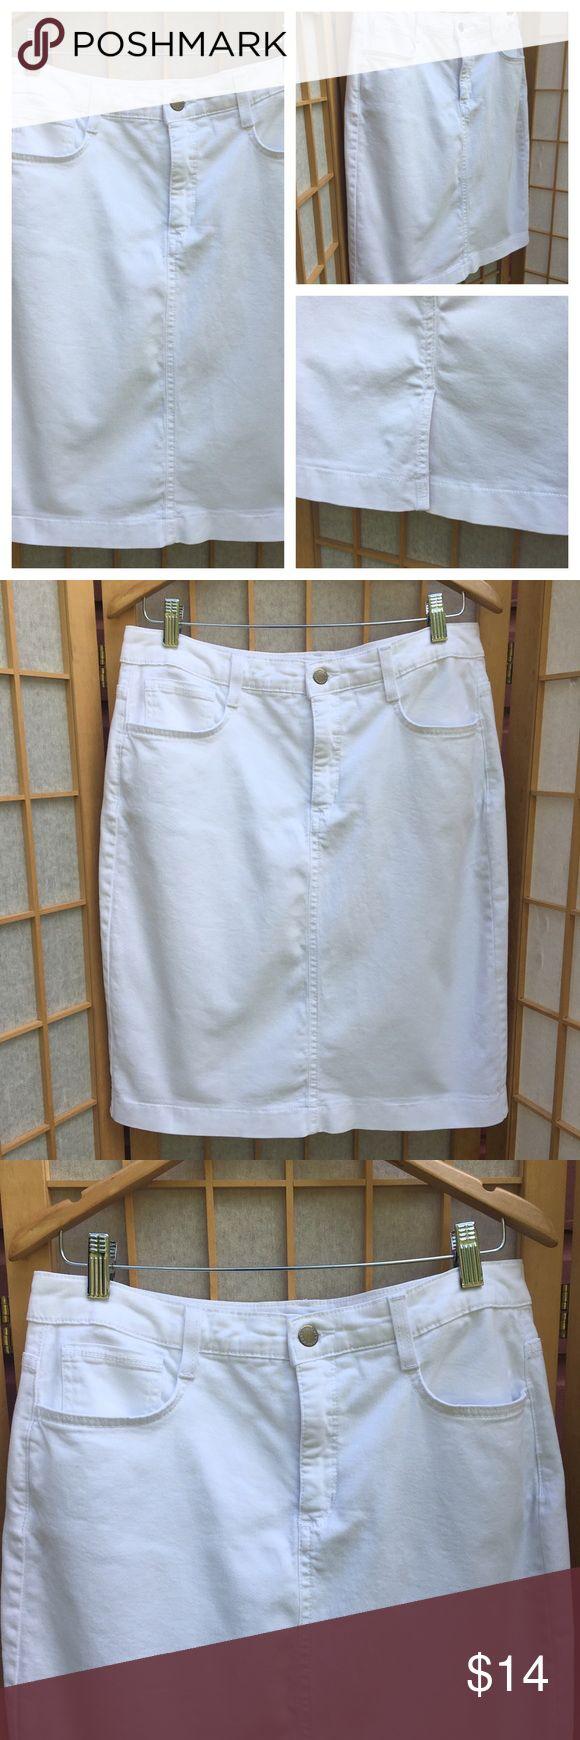 "Jones New York White Jean Pencil Skirt SZ 10 White Jean pencil skirt....two front pockets, two back pockets.....zip up front with button closure....madison skirt from Jones New York Jeans... approximate measurements.     waist 16"".  length 22"". hip 20""....has stretch.... Jones New York Jeans Skirts Pencil"